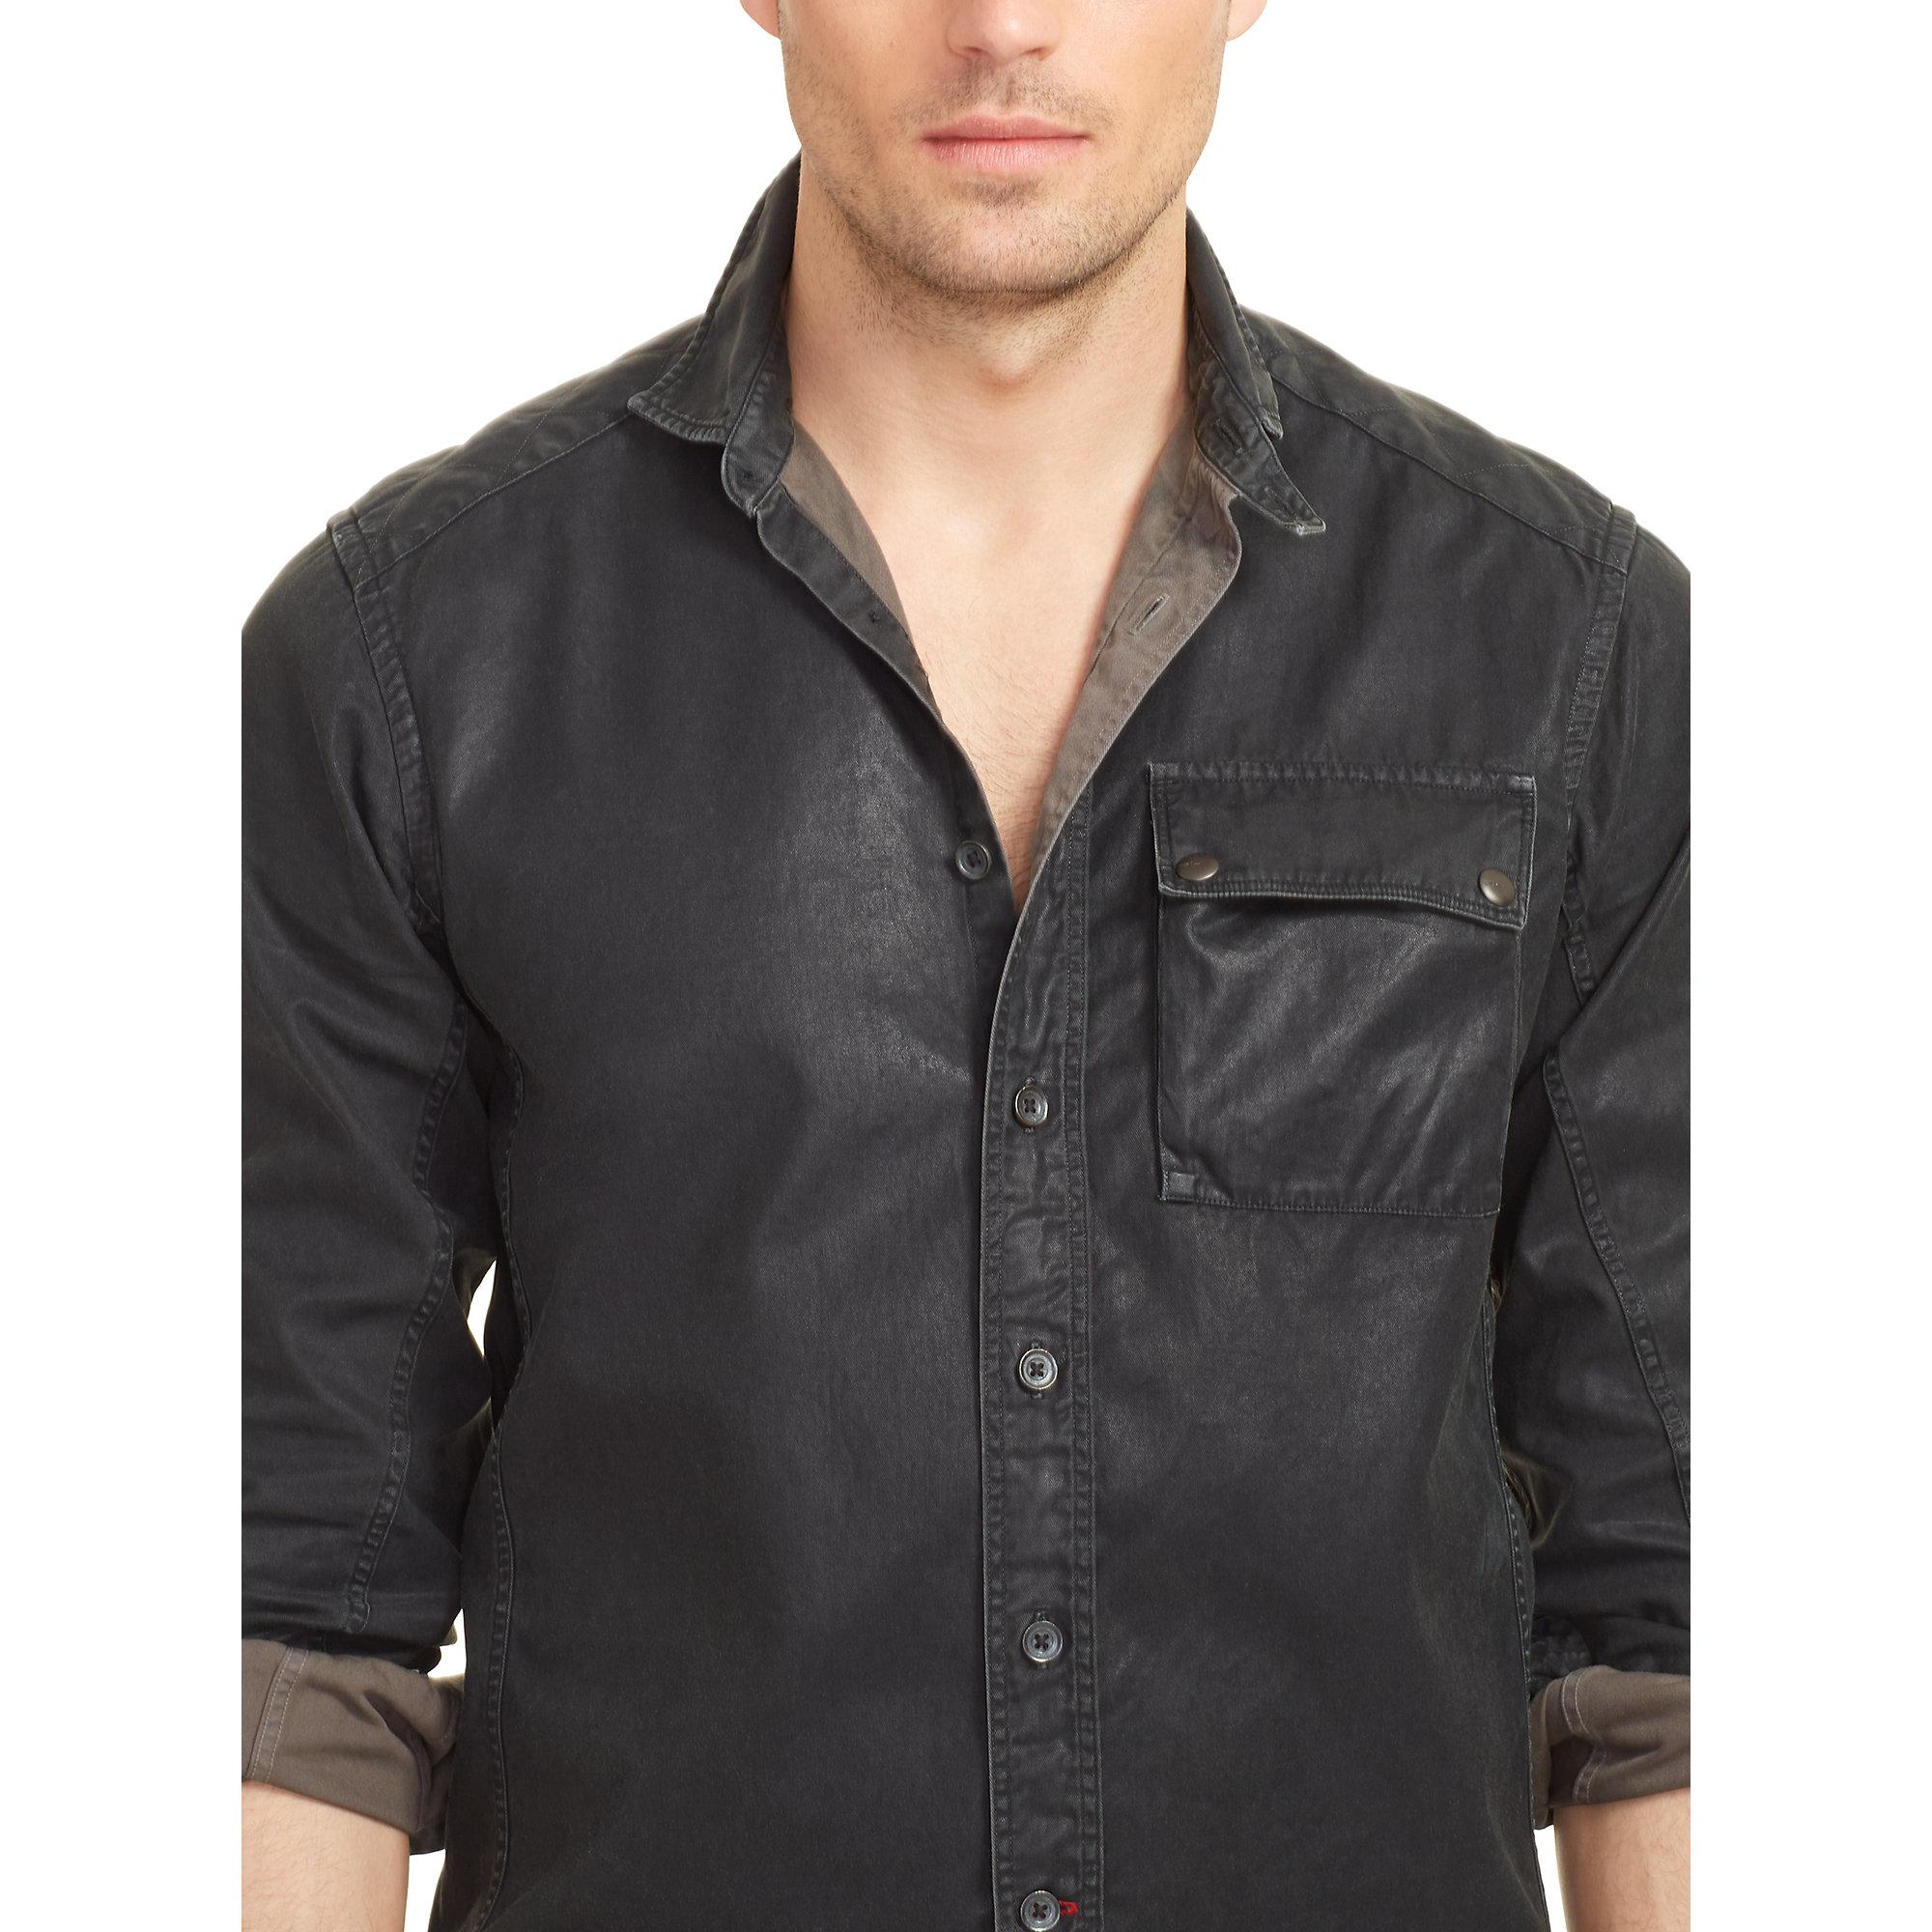 785f5e7ff07d1 Lyst - Ralph Lauren Black Label Coated-cotton-twill Moto Shirt in ...